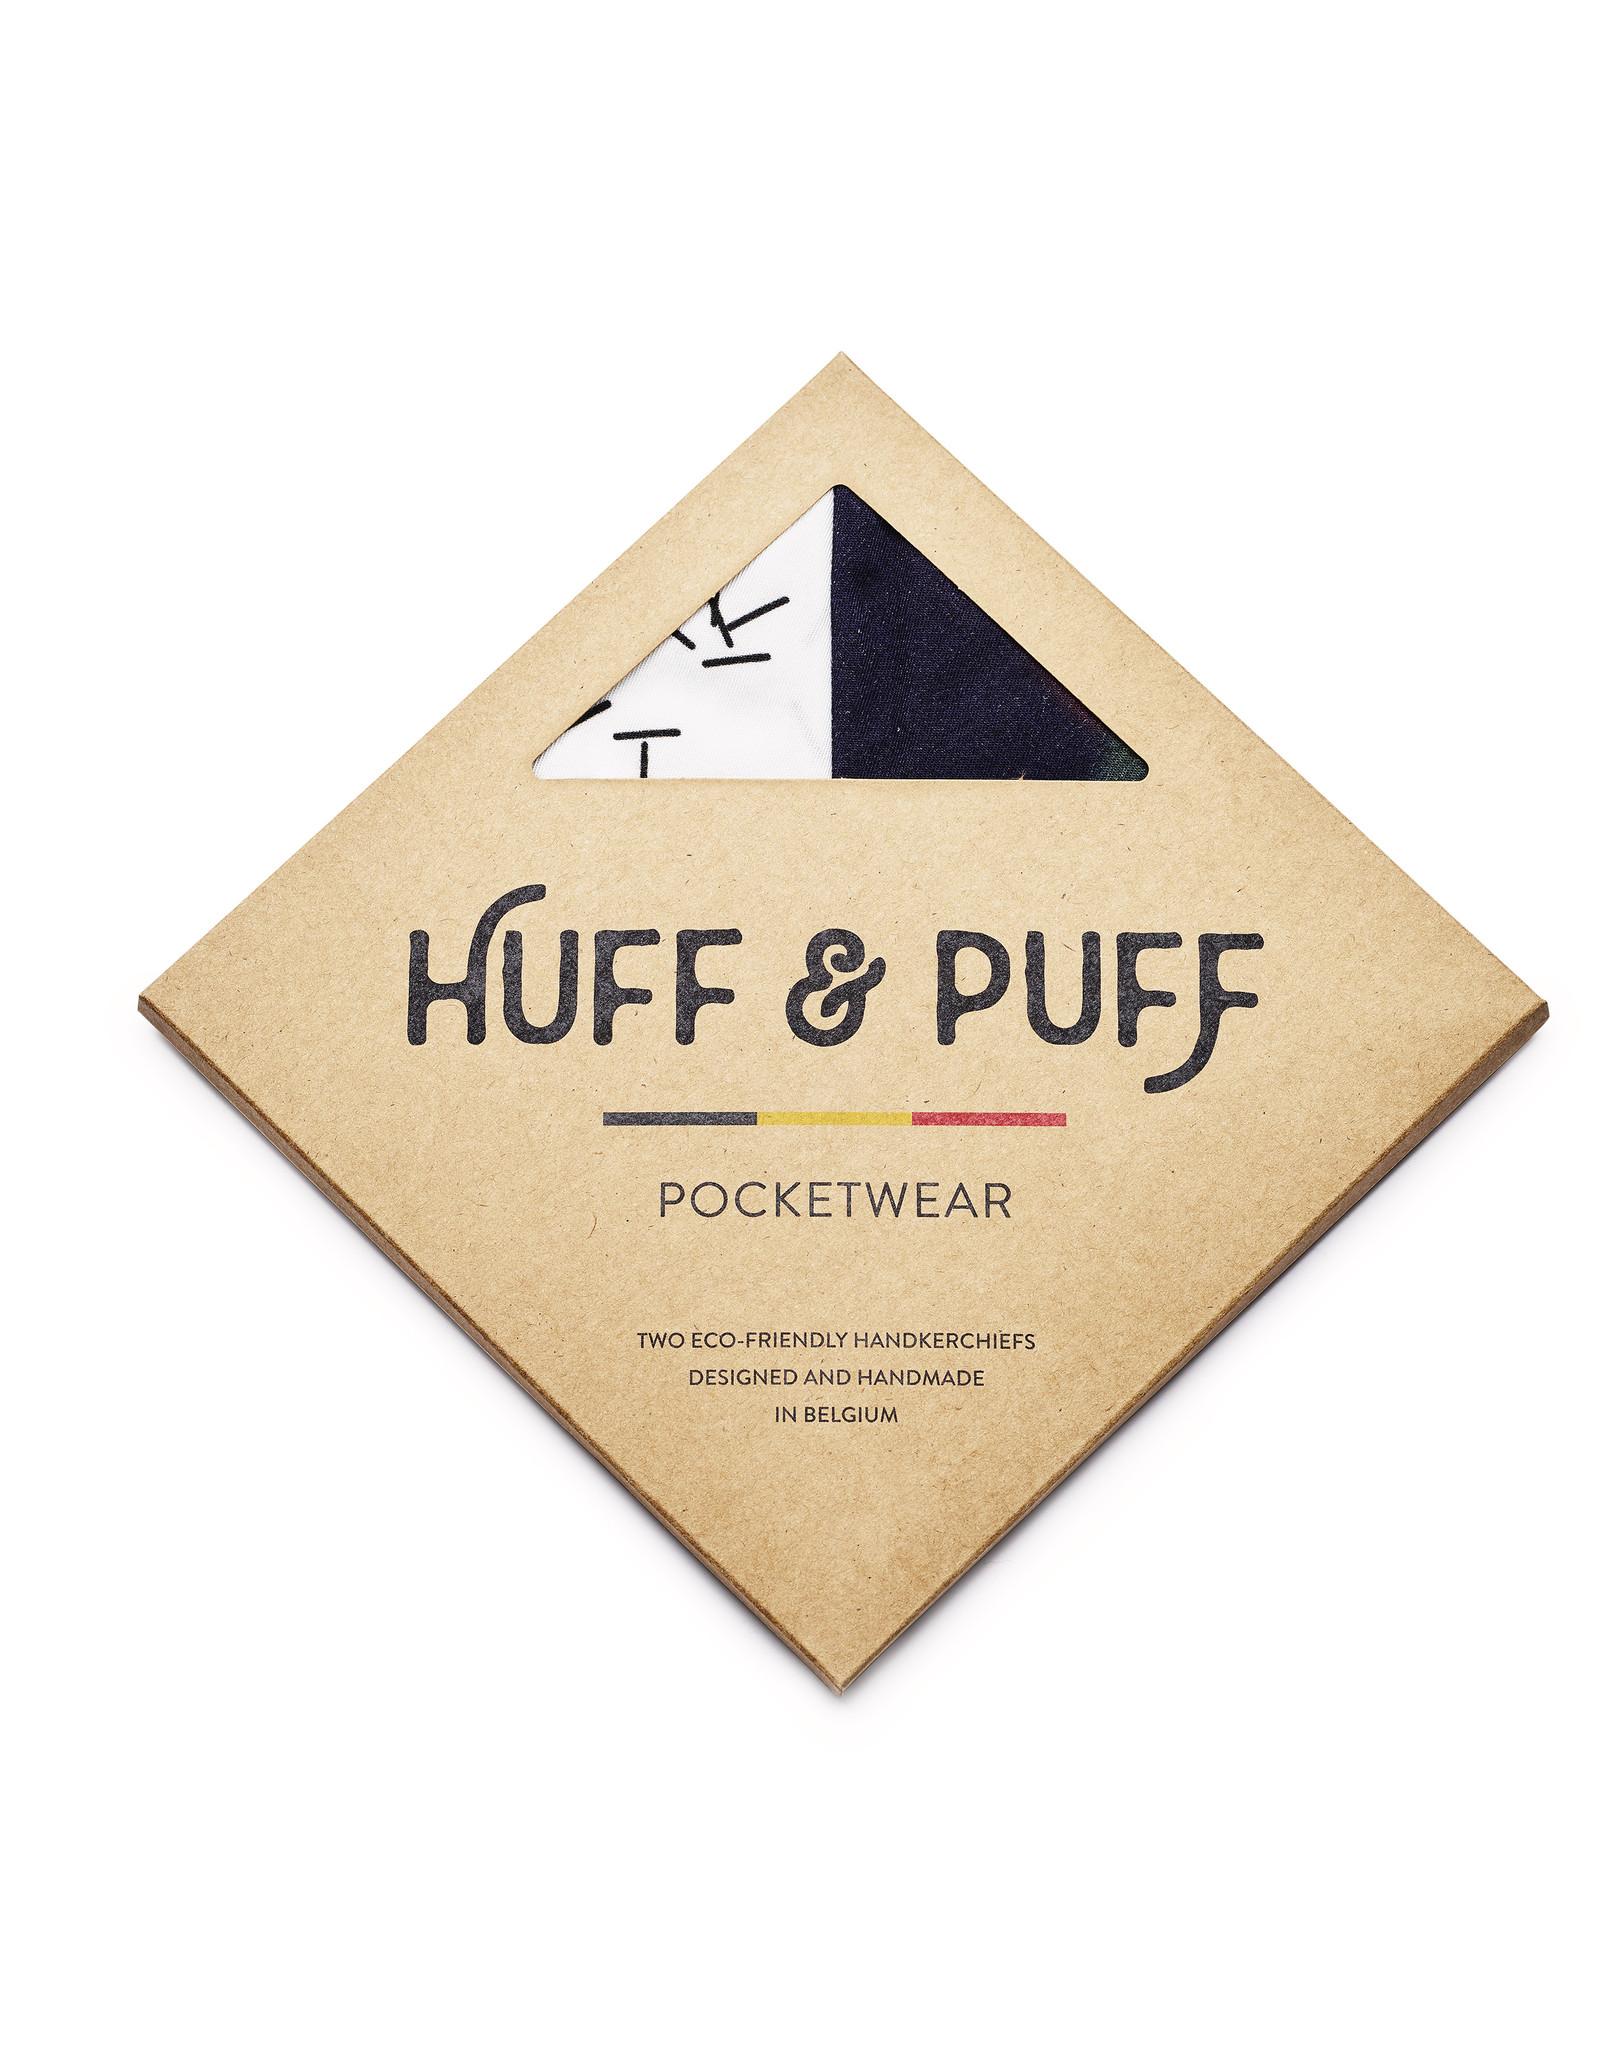 Huff&Puff Zakdoeken: the psycho